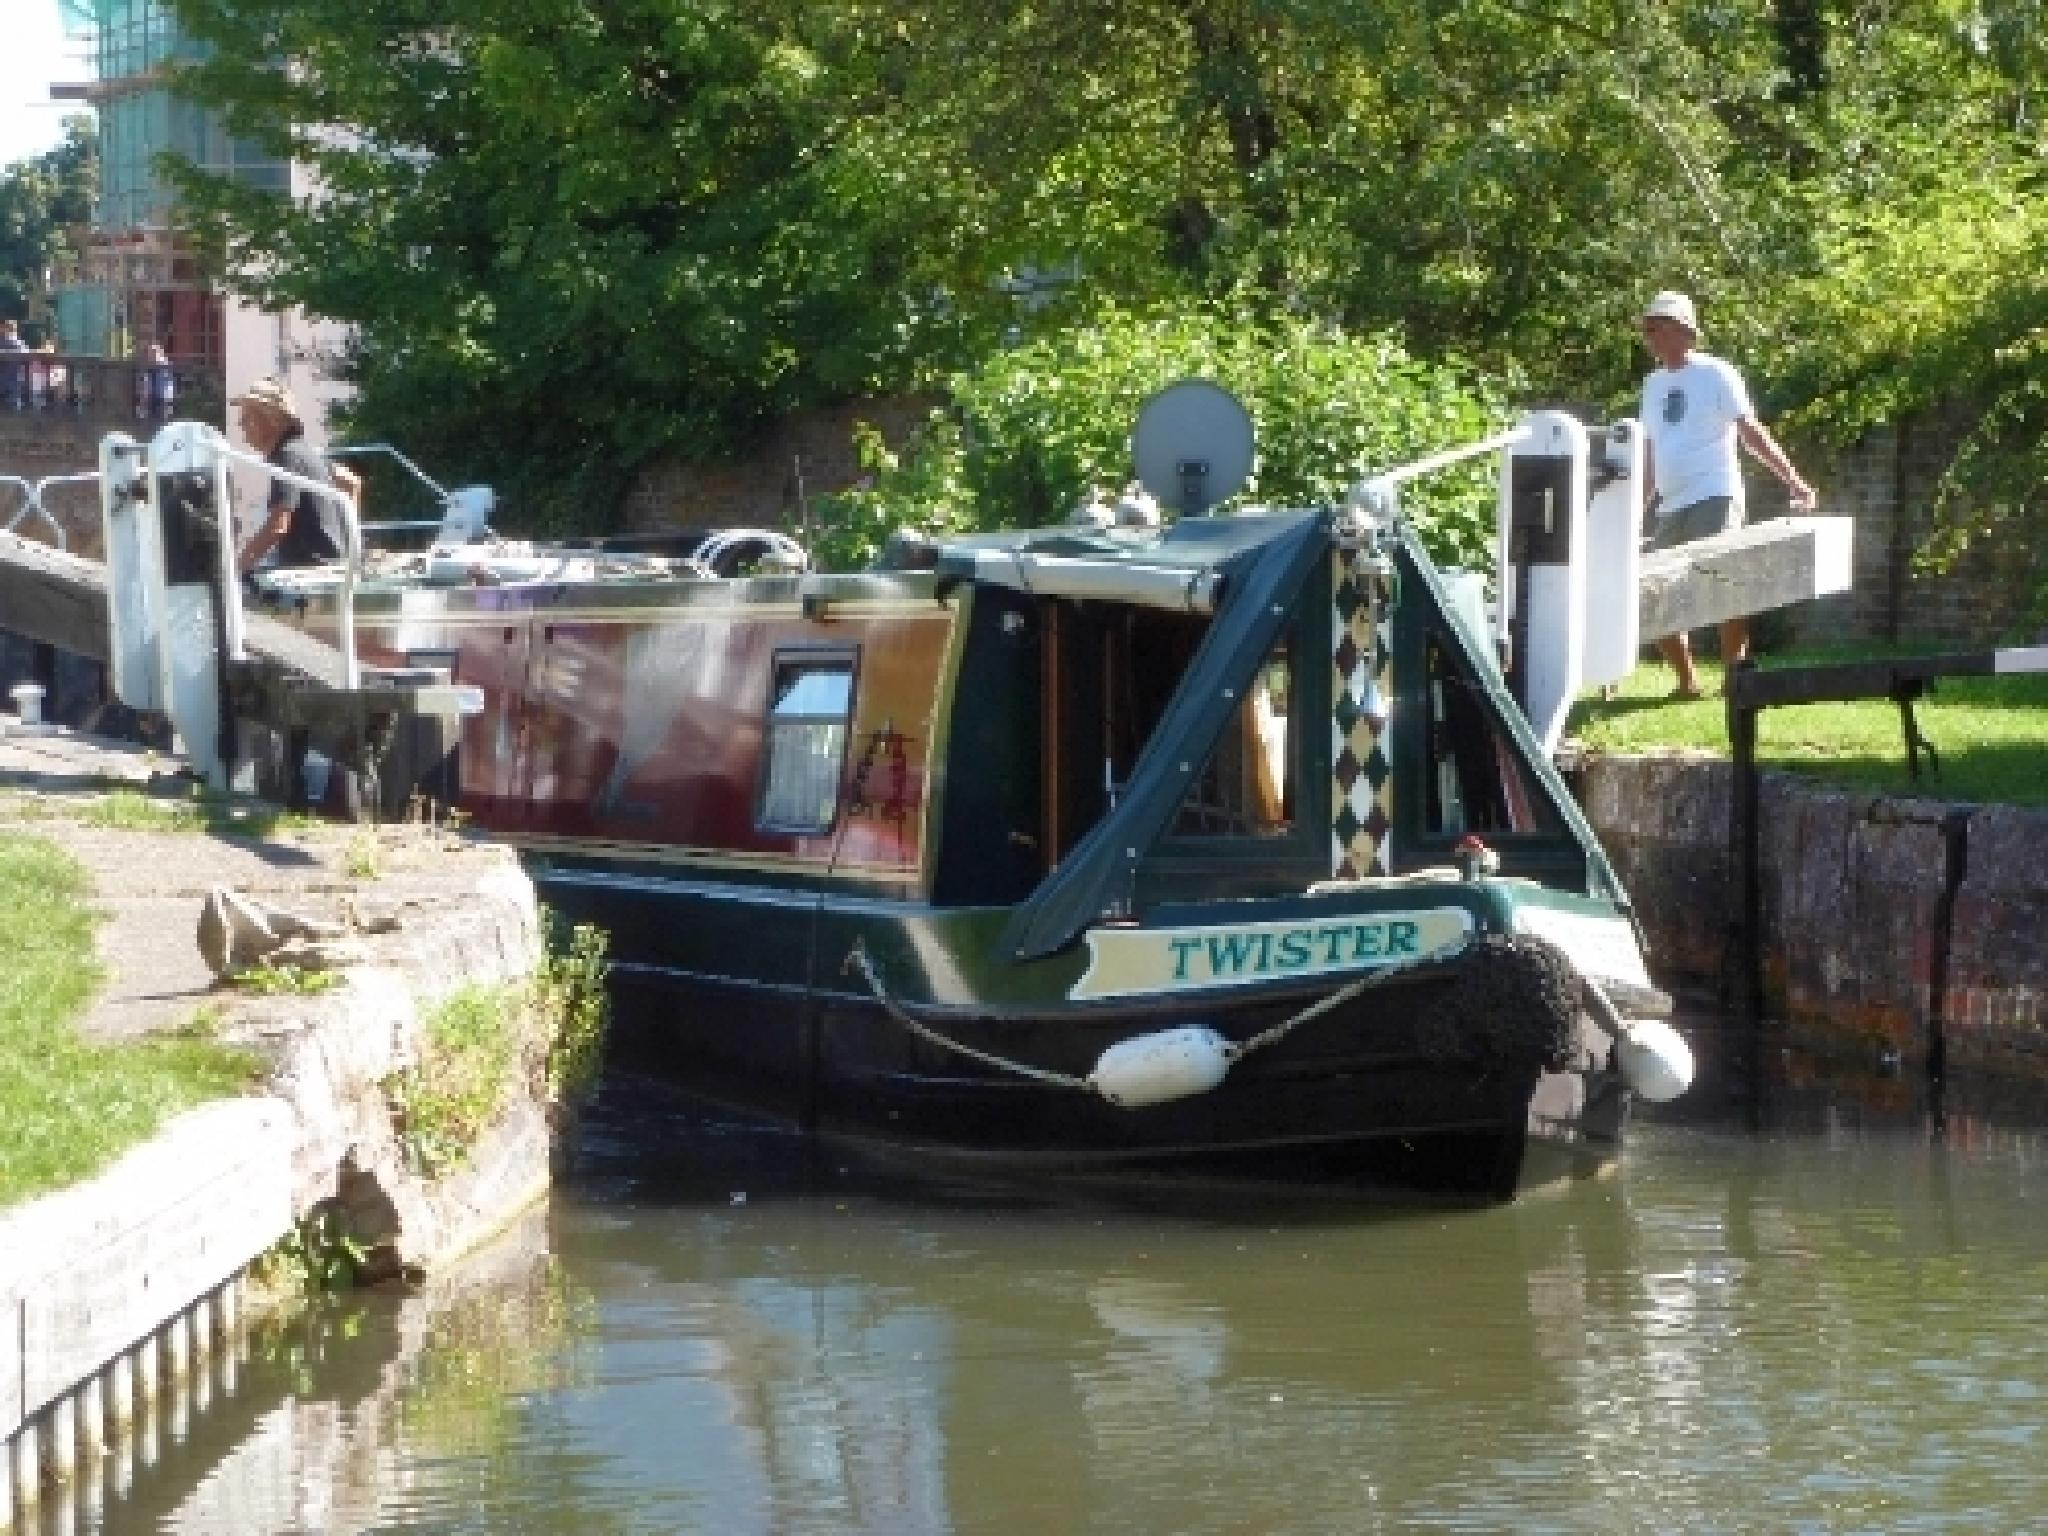 Twisting Through The Canal by GaryMHough